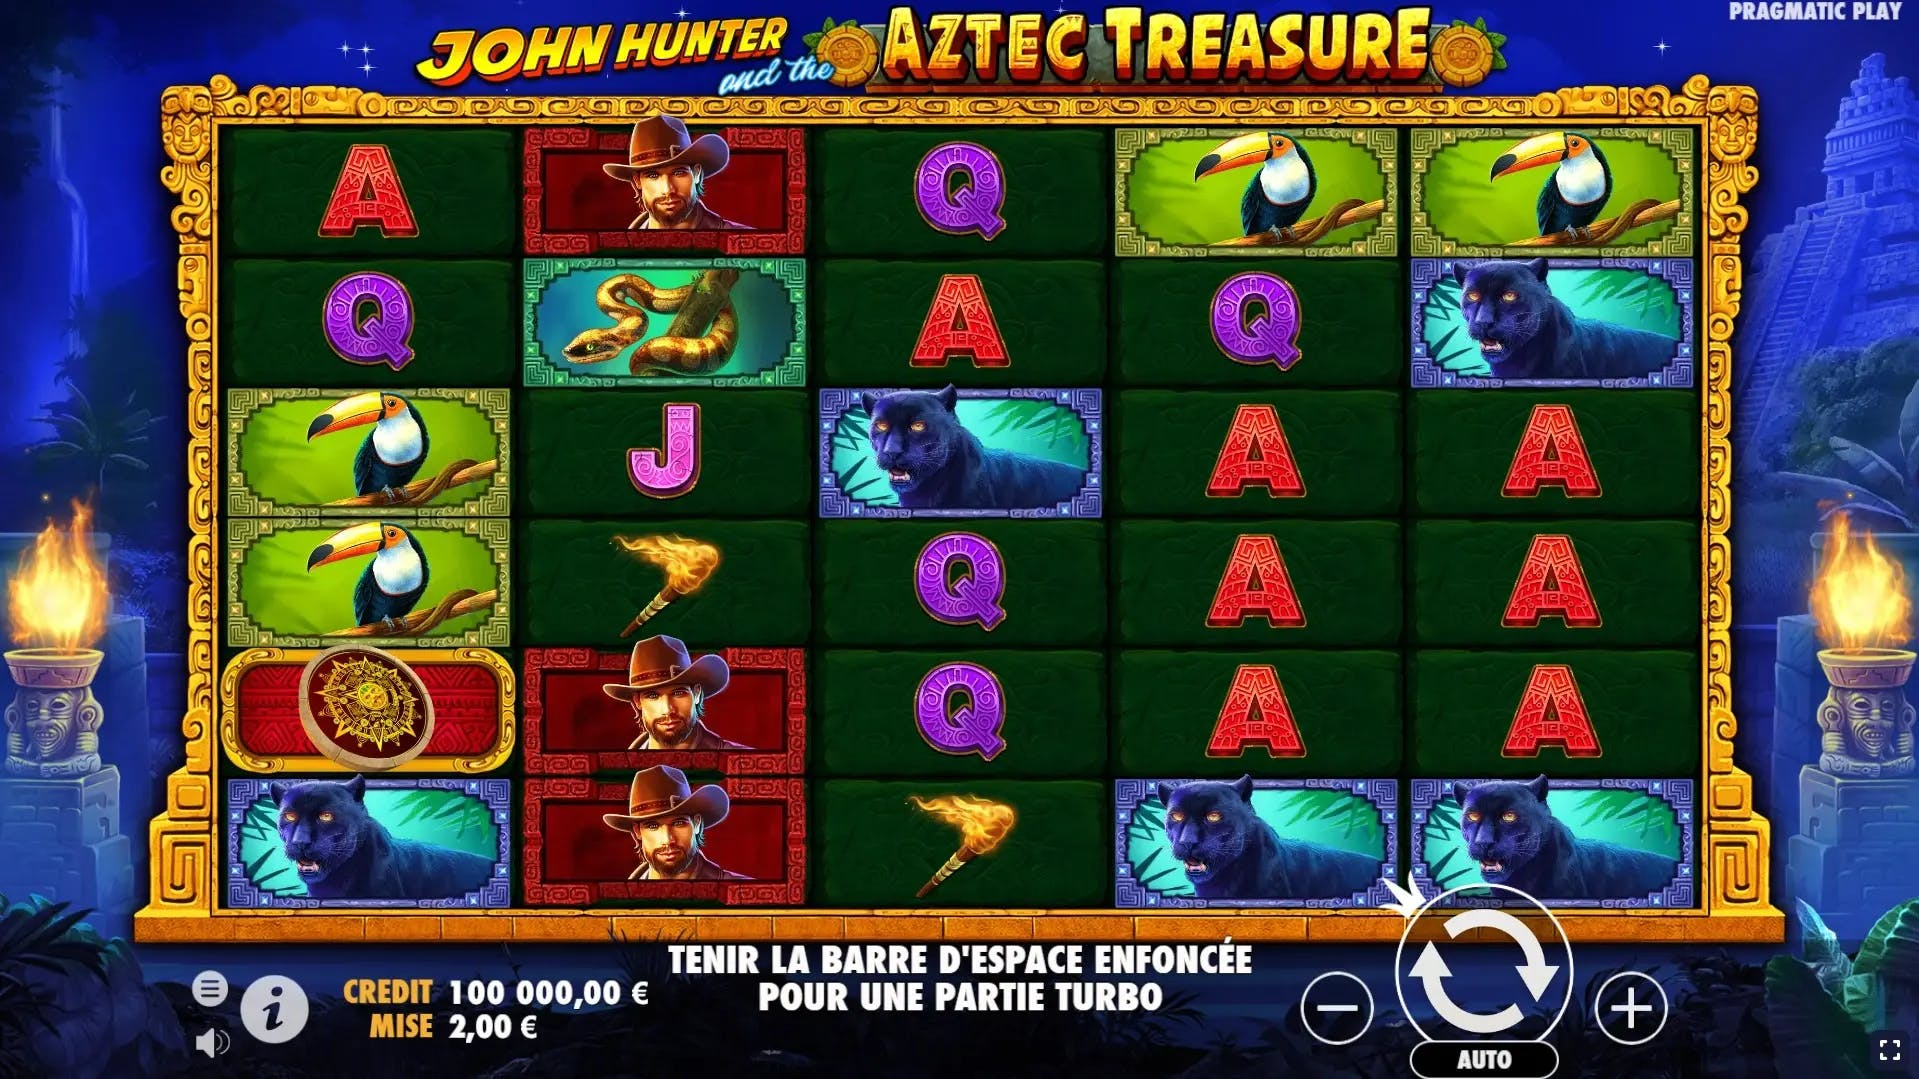 gameplay de john hunter and the aztec treasure de pragmatic play